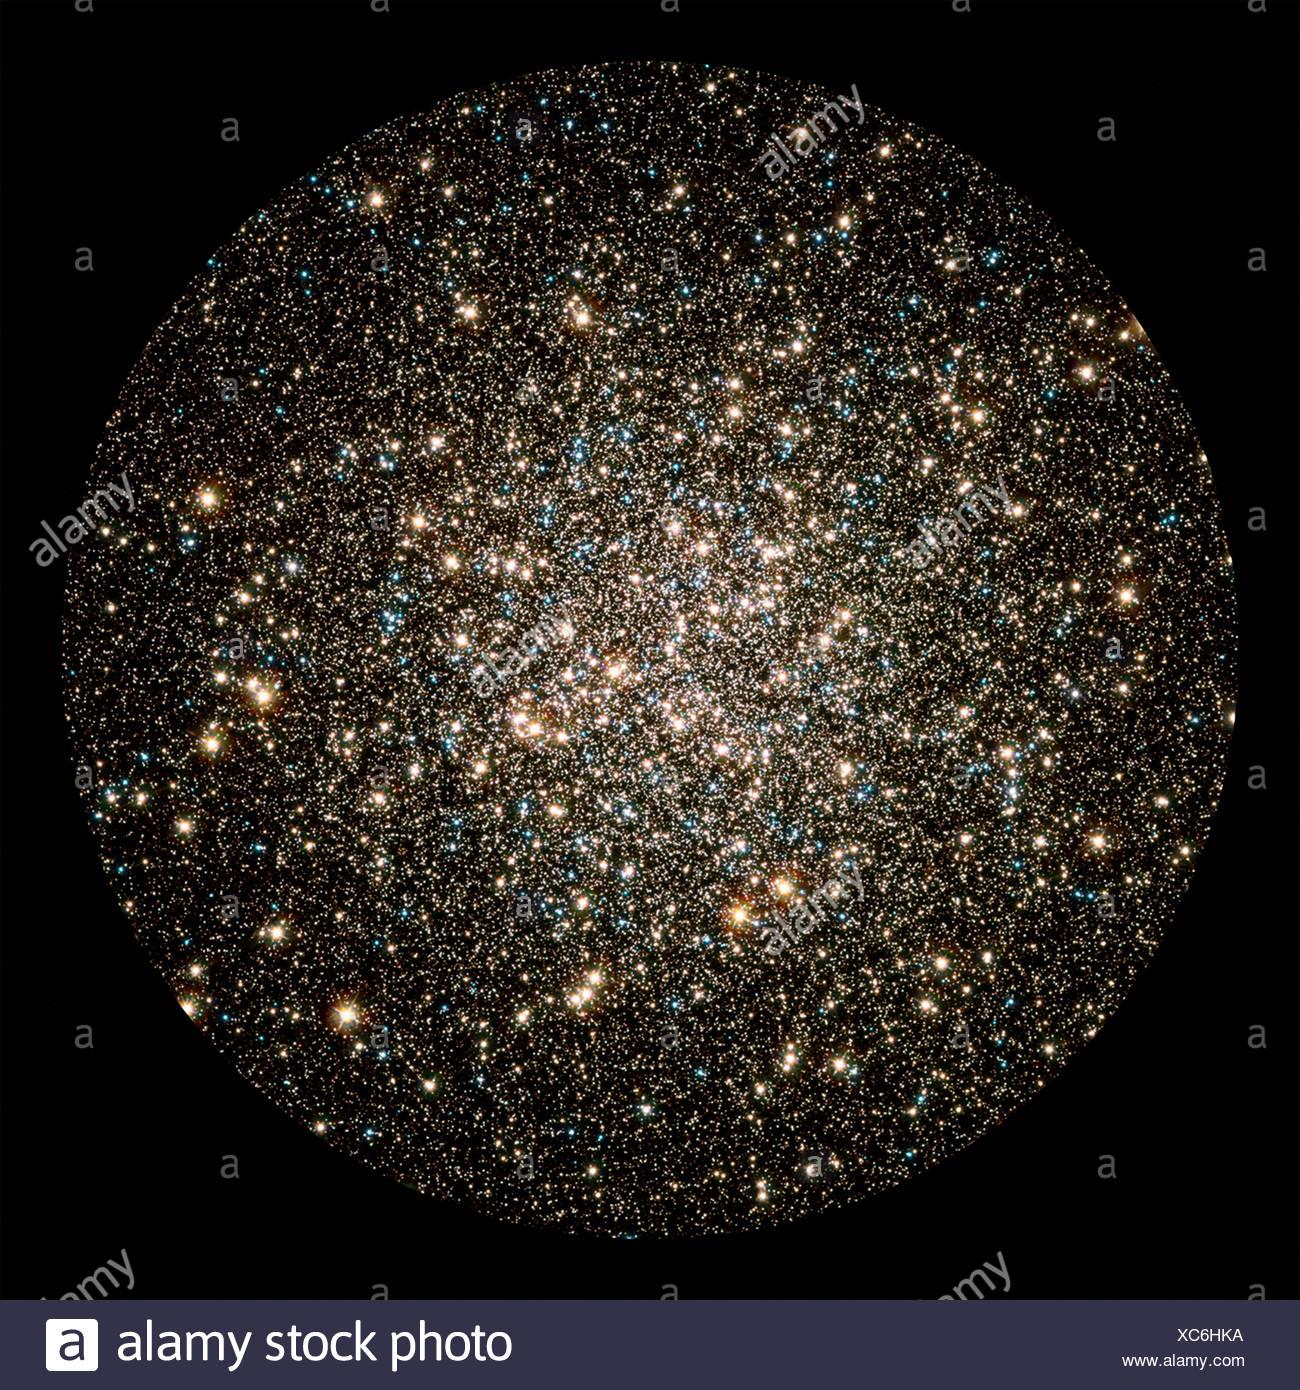 M-13 Globular Cluster - Stock Image